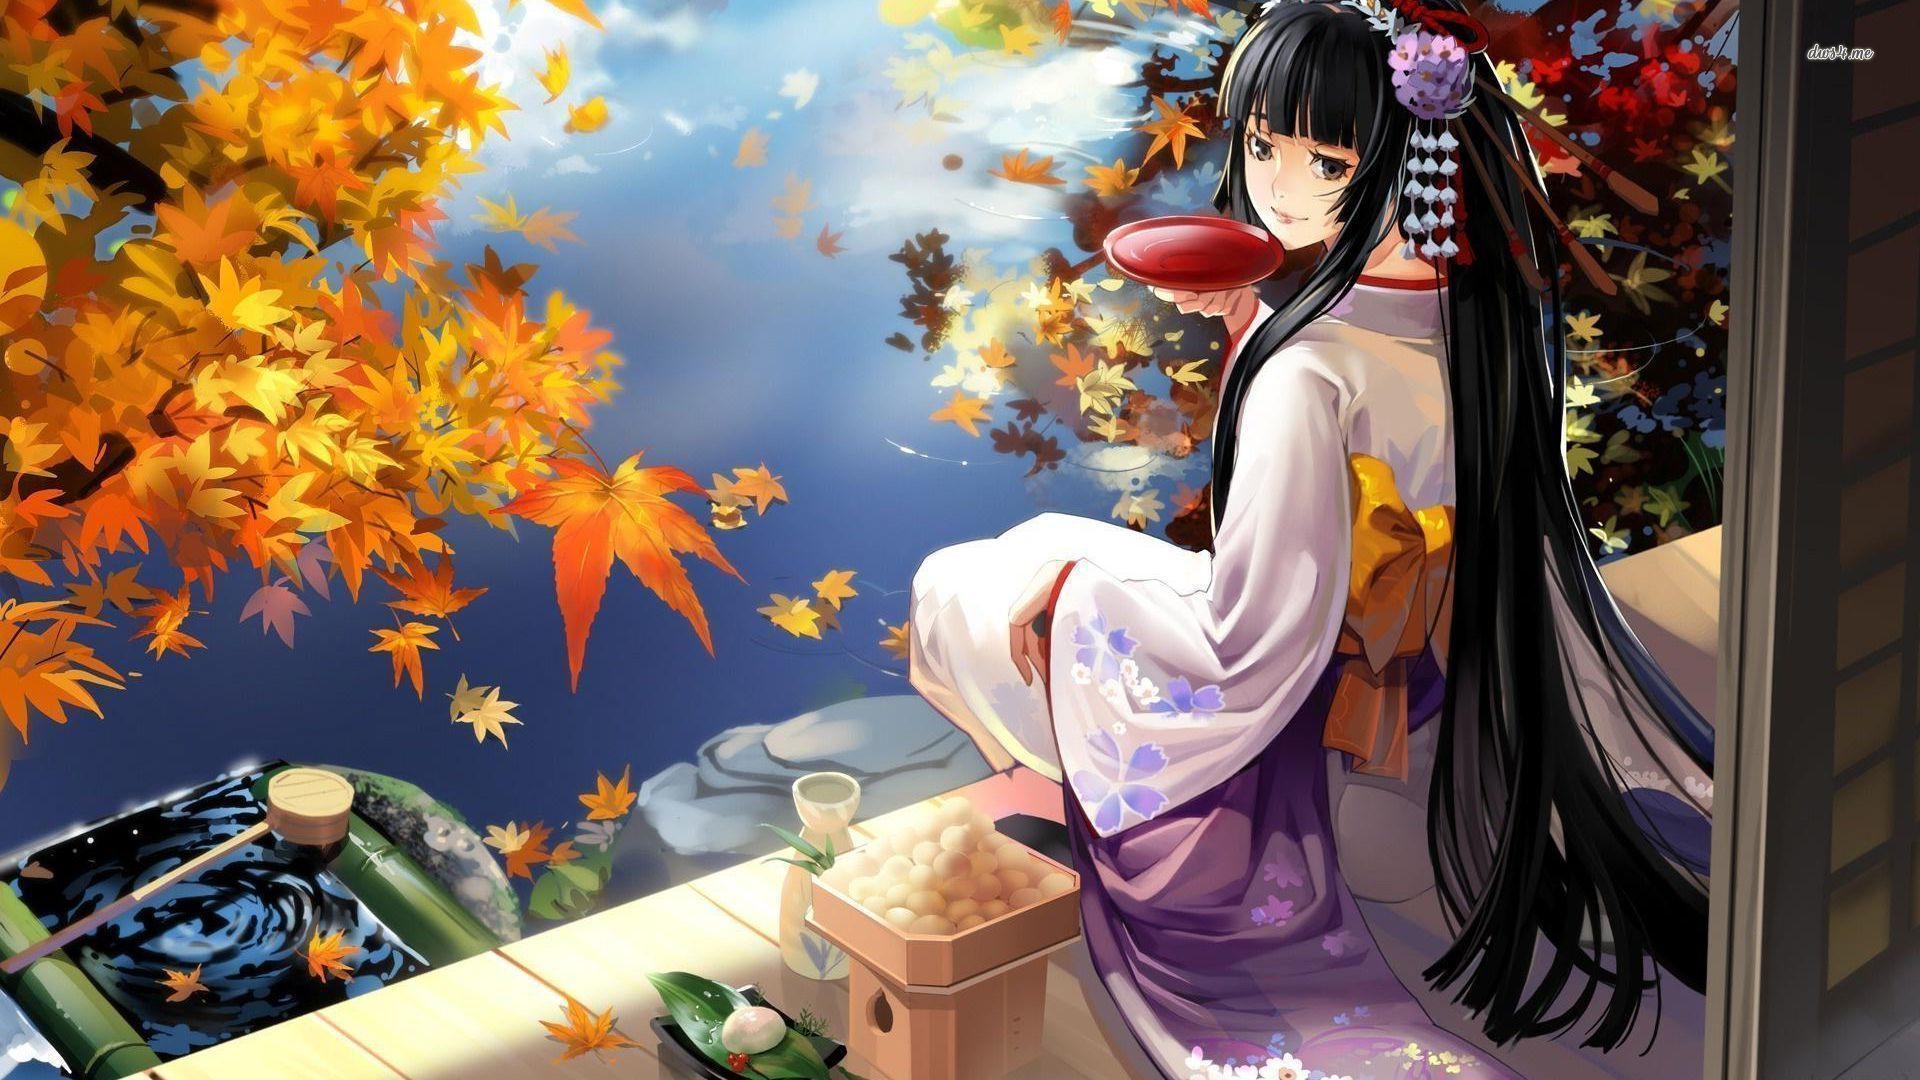 wallpaper geisha corals girl - photo #12